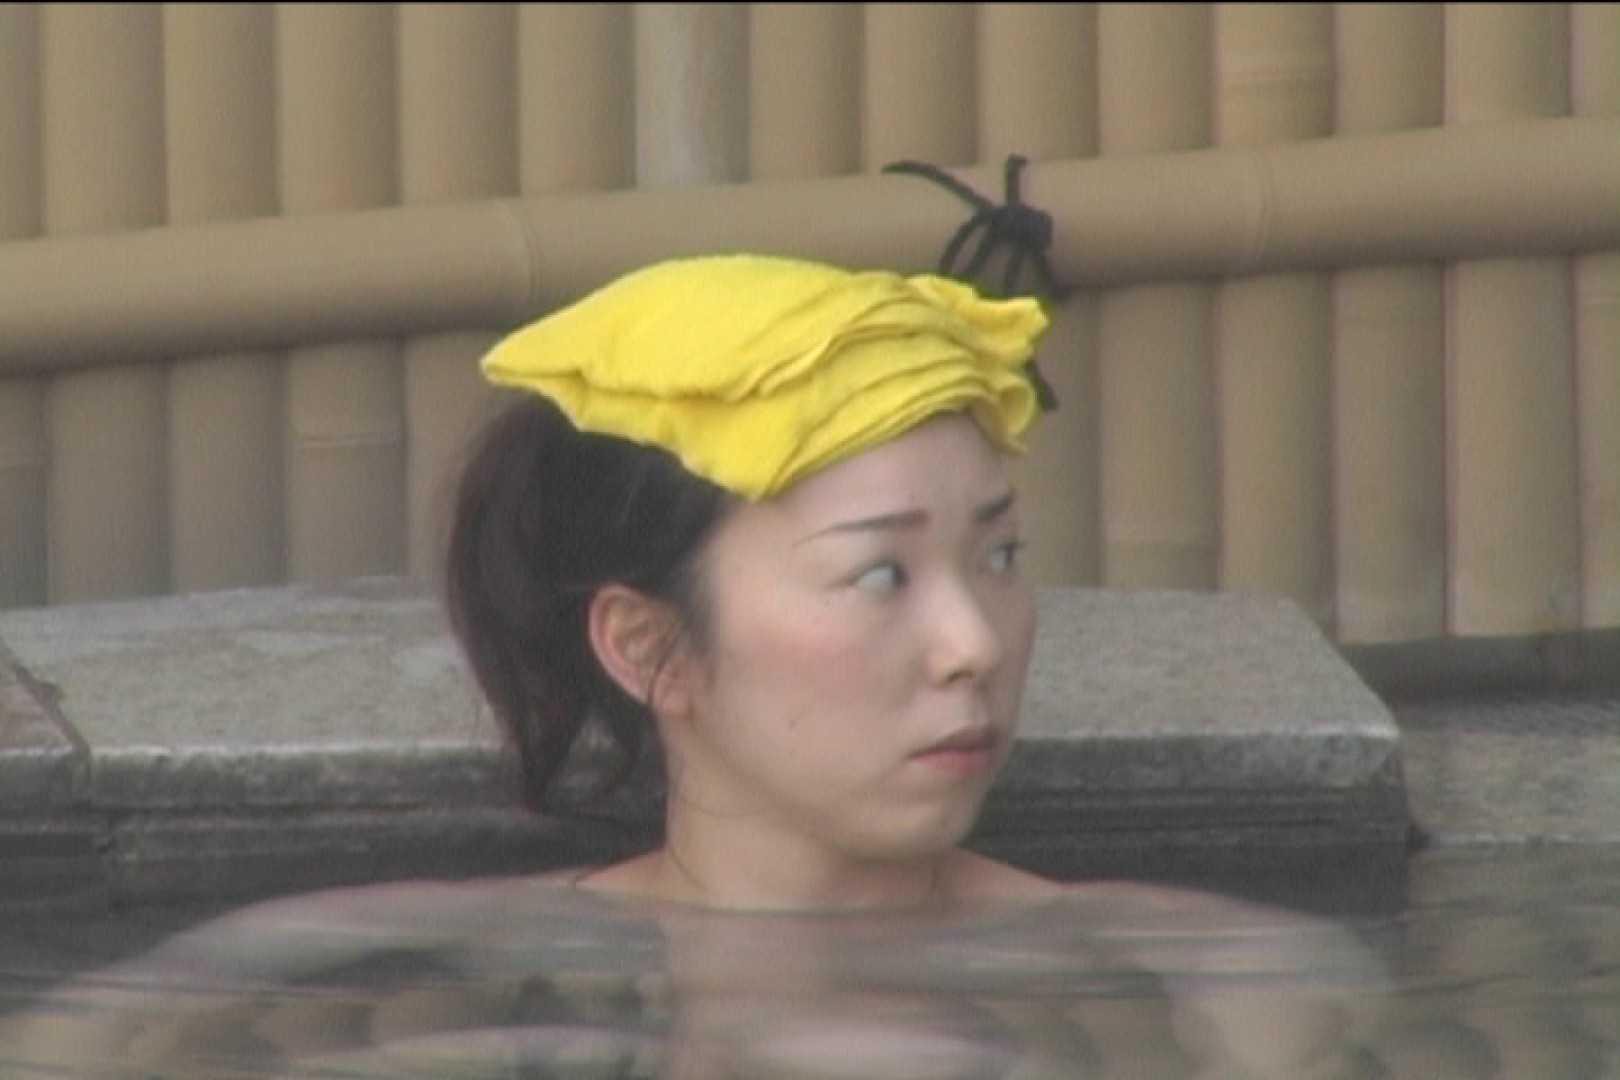 Aquaな露天風呂Vol.529 盗撮映像  51Pix 29